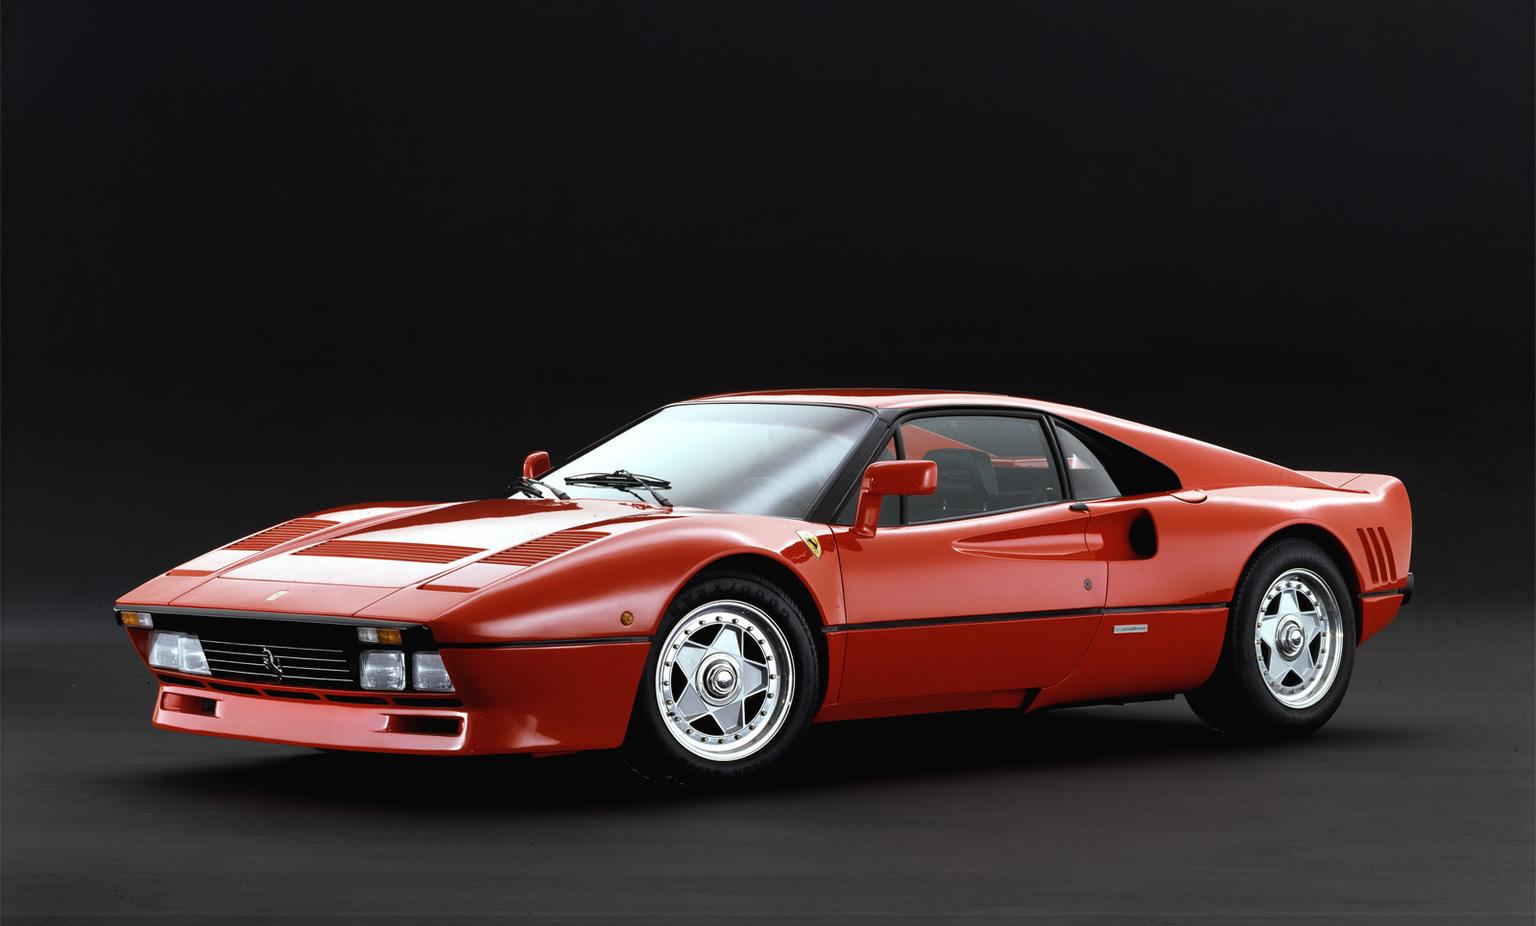 ferrari-288-GTO-hitech-sport